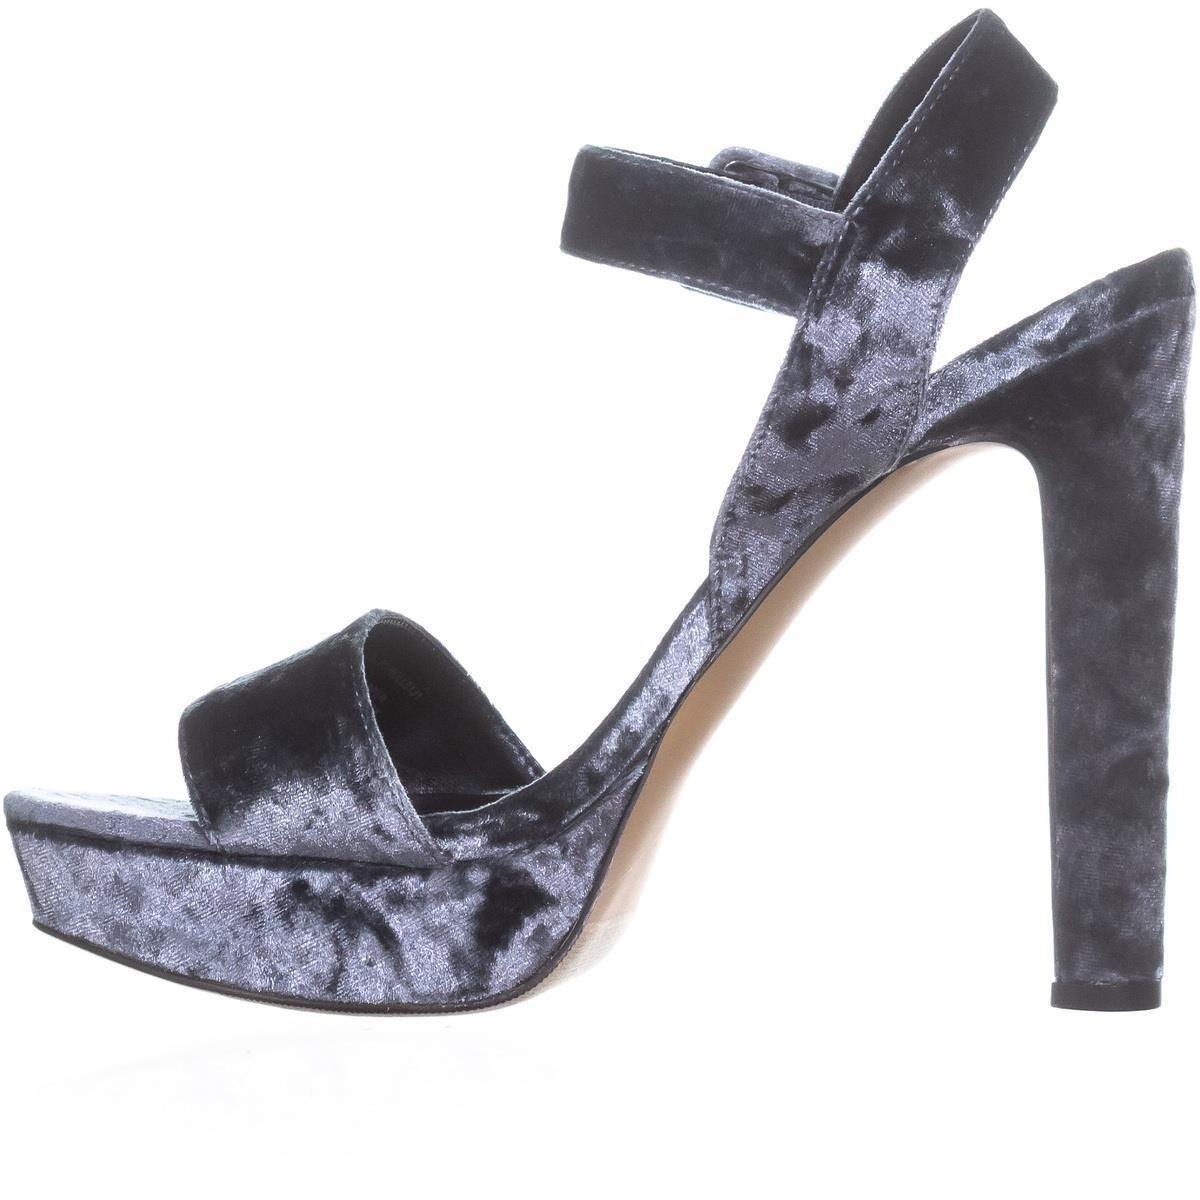 e9c88318e4b7 Shop madden girl Rollo Heeled Sandals